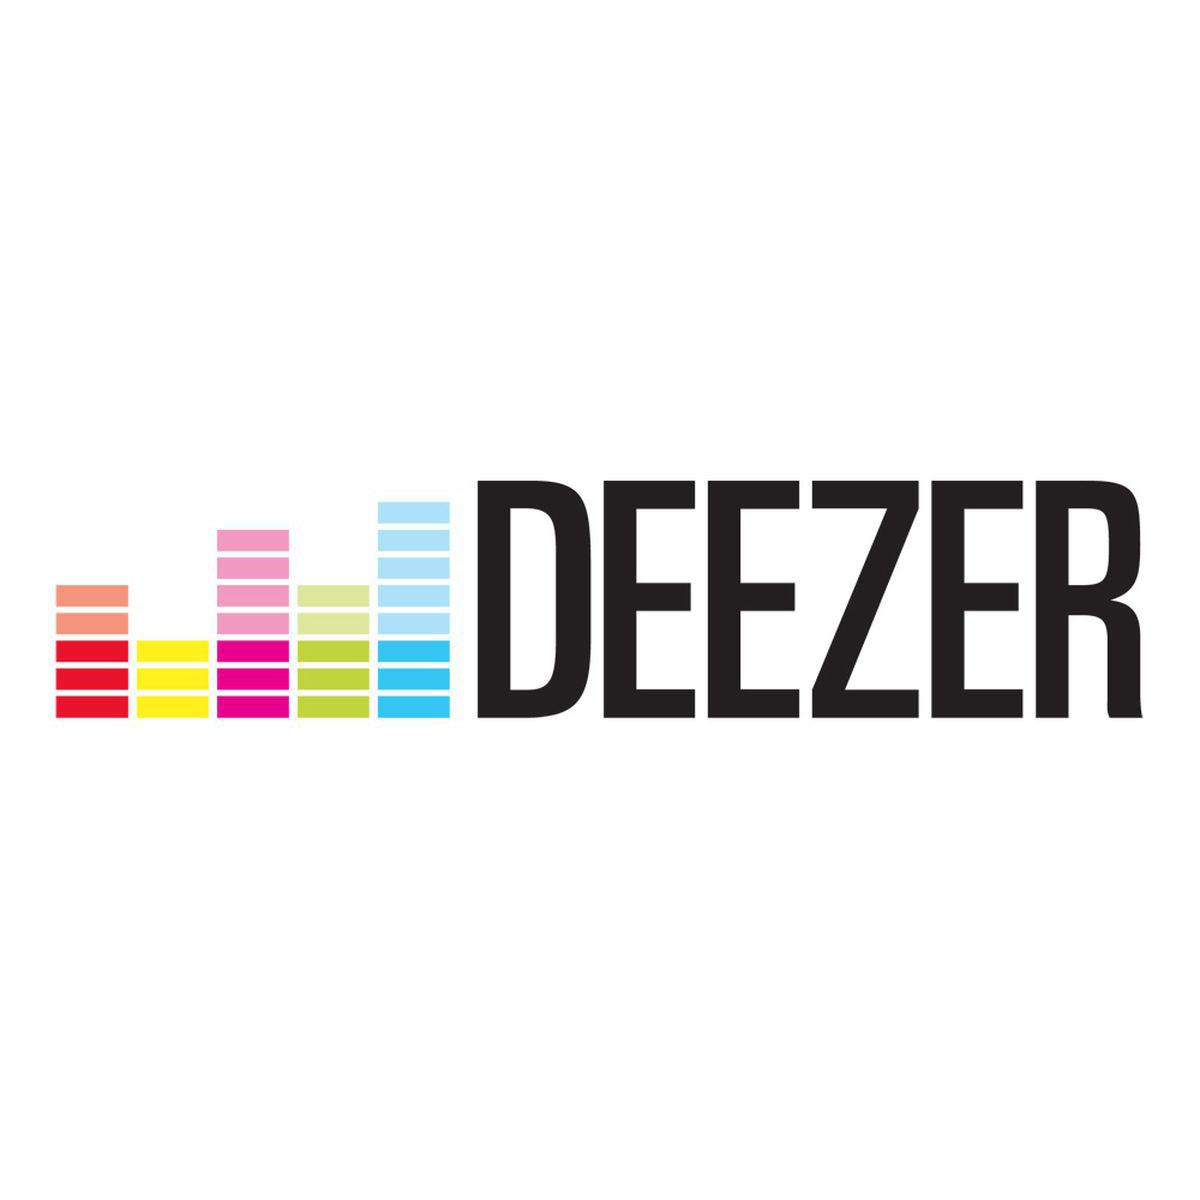 Migration from MusicBrainz to Deezer